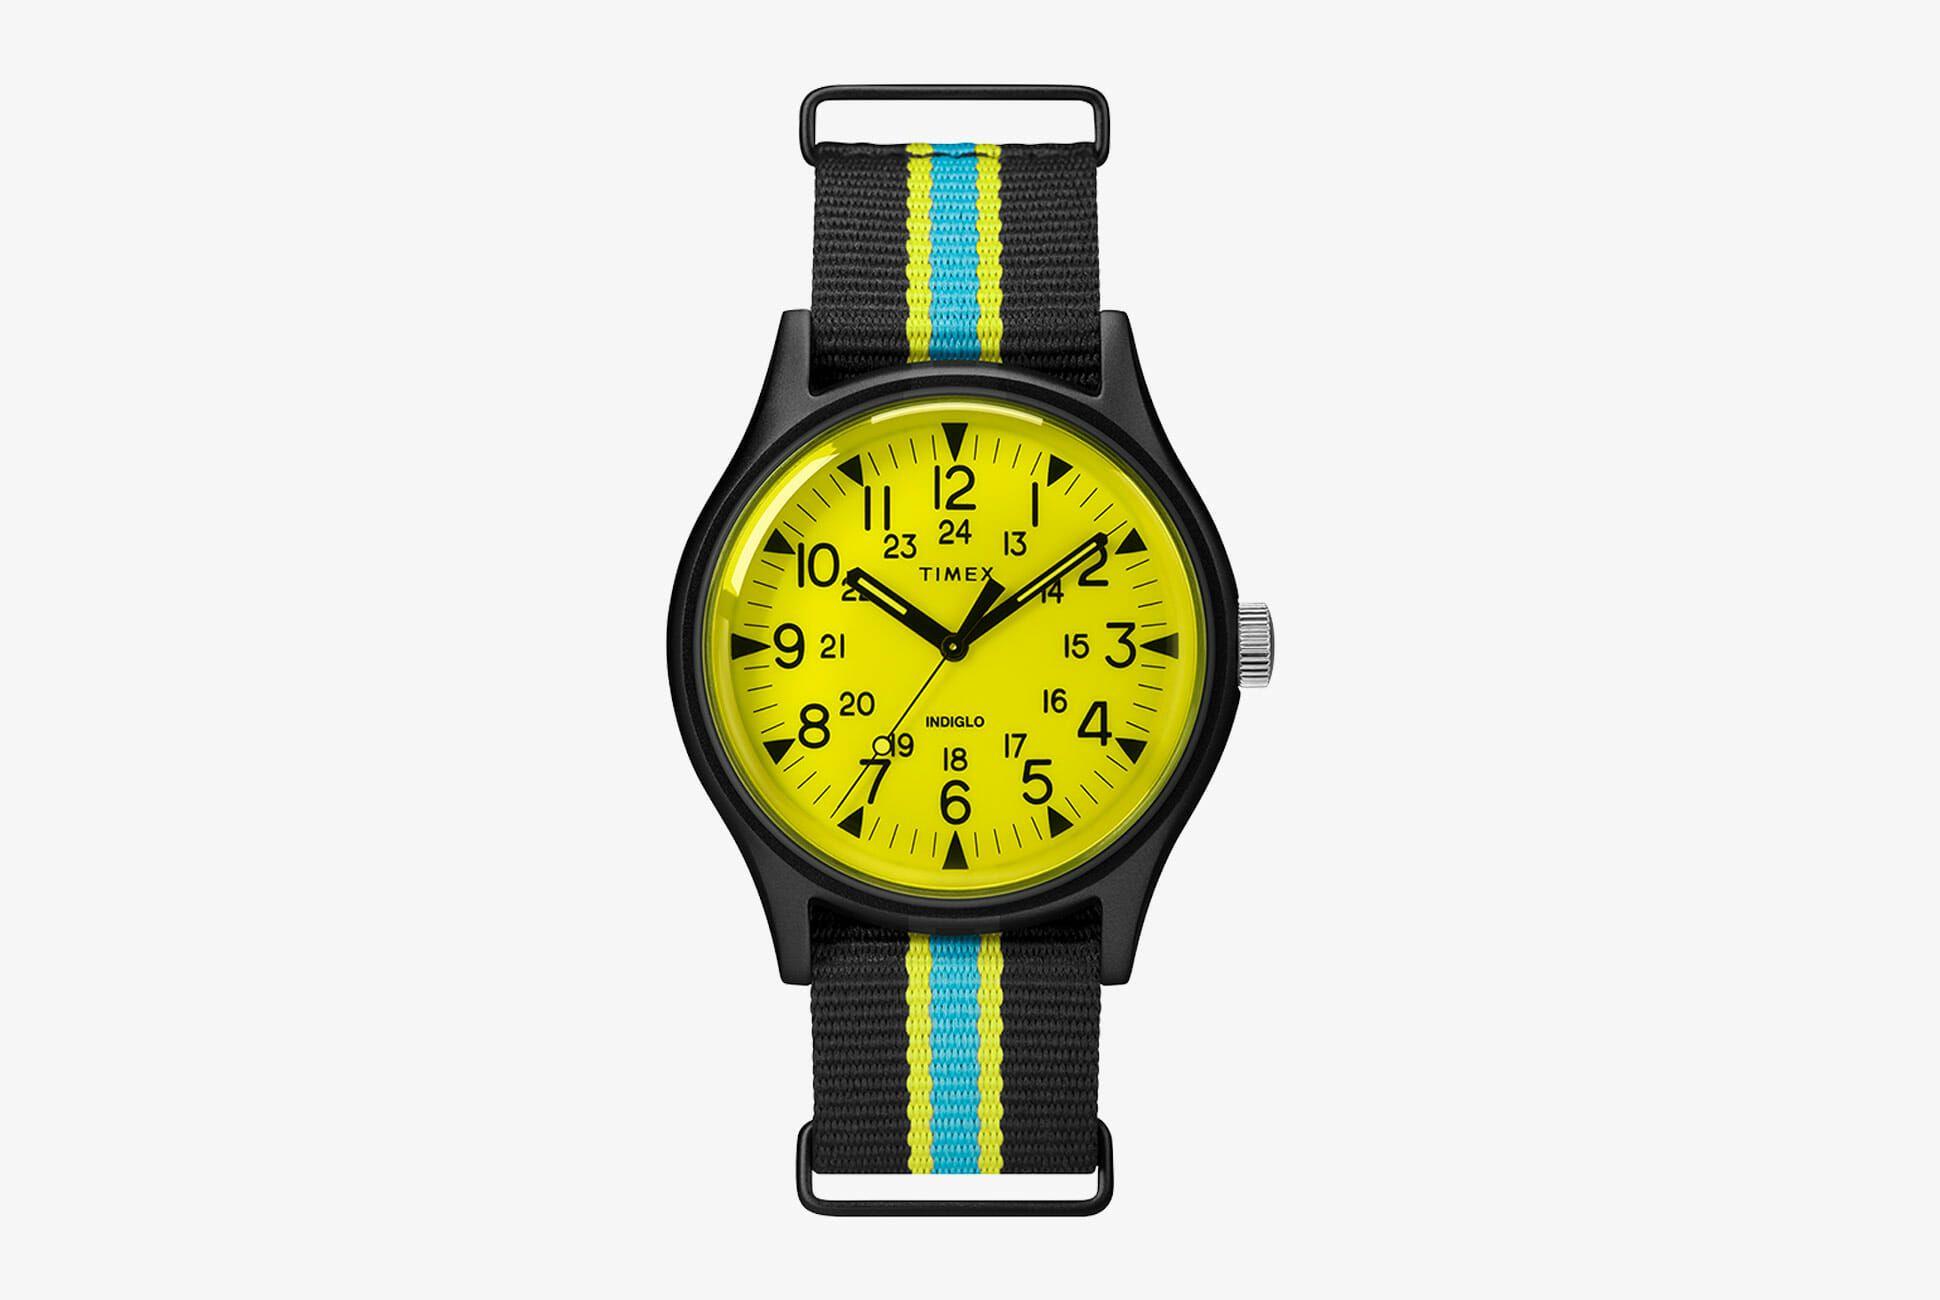 Timex-California-Deal-Gear-Patrol-Slide-3